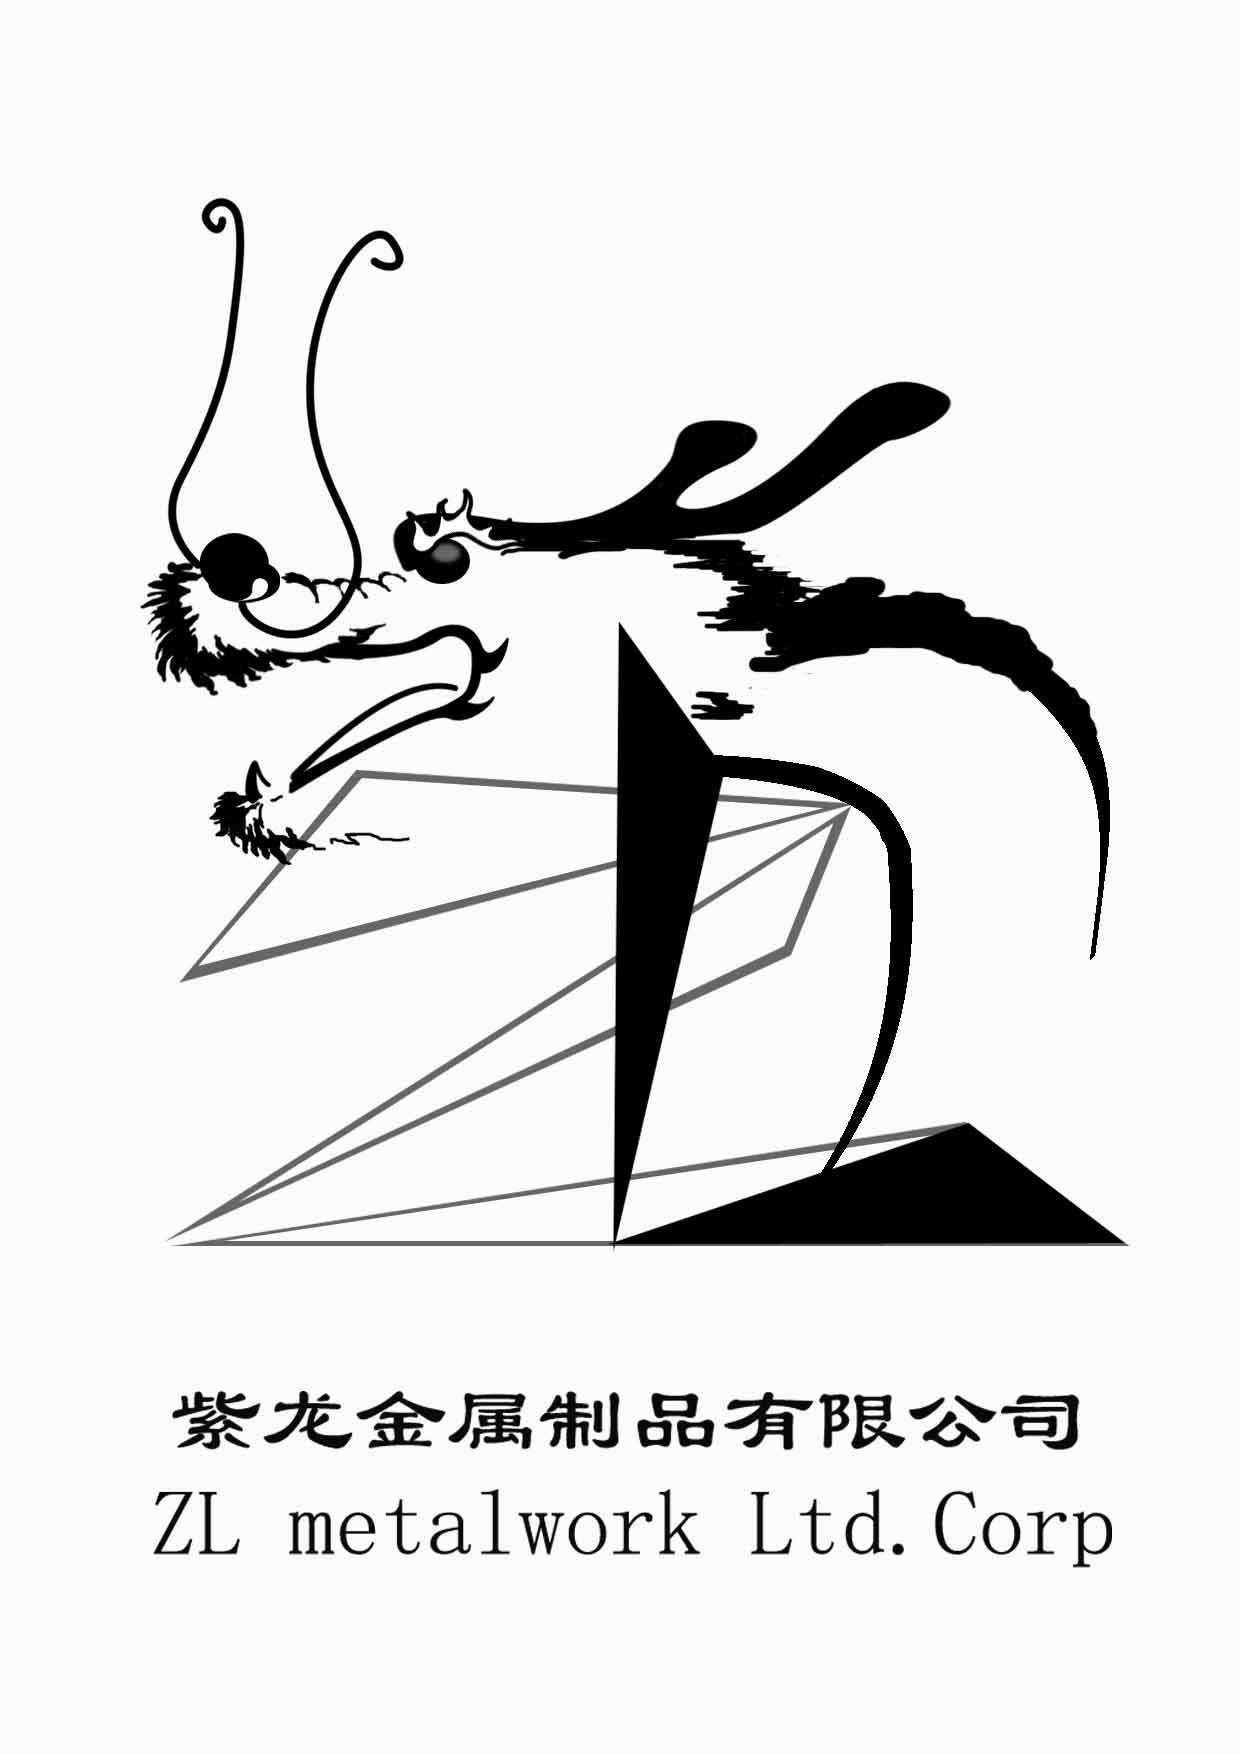 zl设计成龙的图形logo_874916_k68威客网